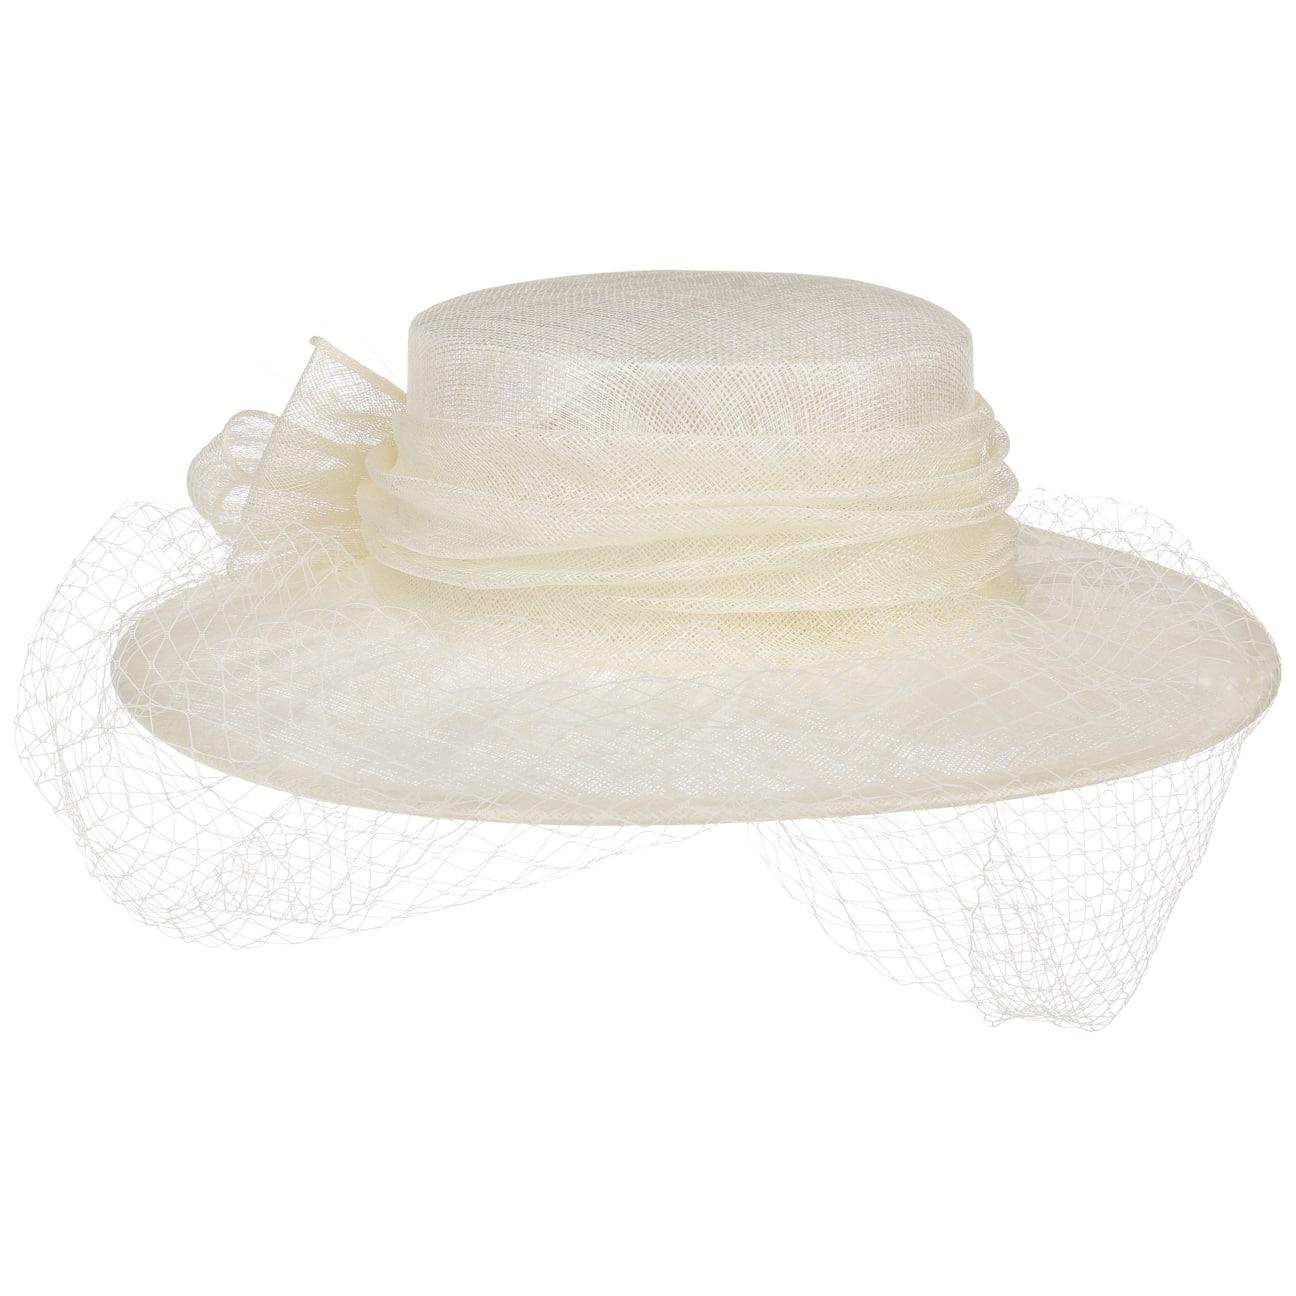 Matelot Occasion Hat By McBURN, GBP 81,95 --> Hats, Caps